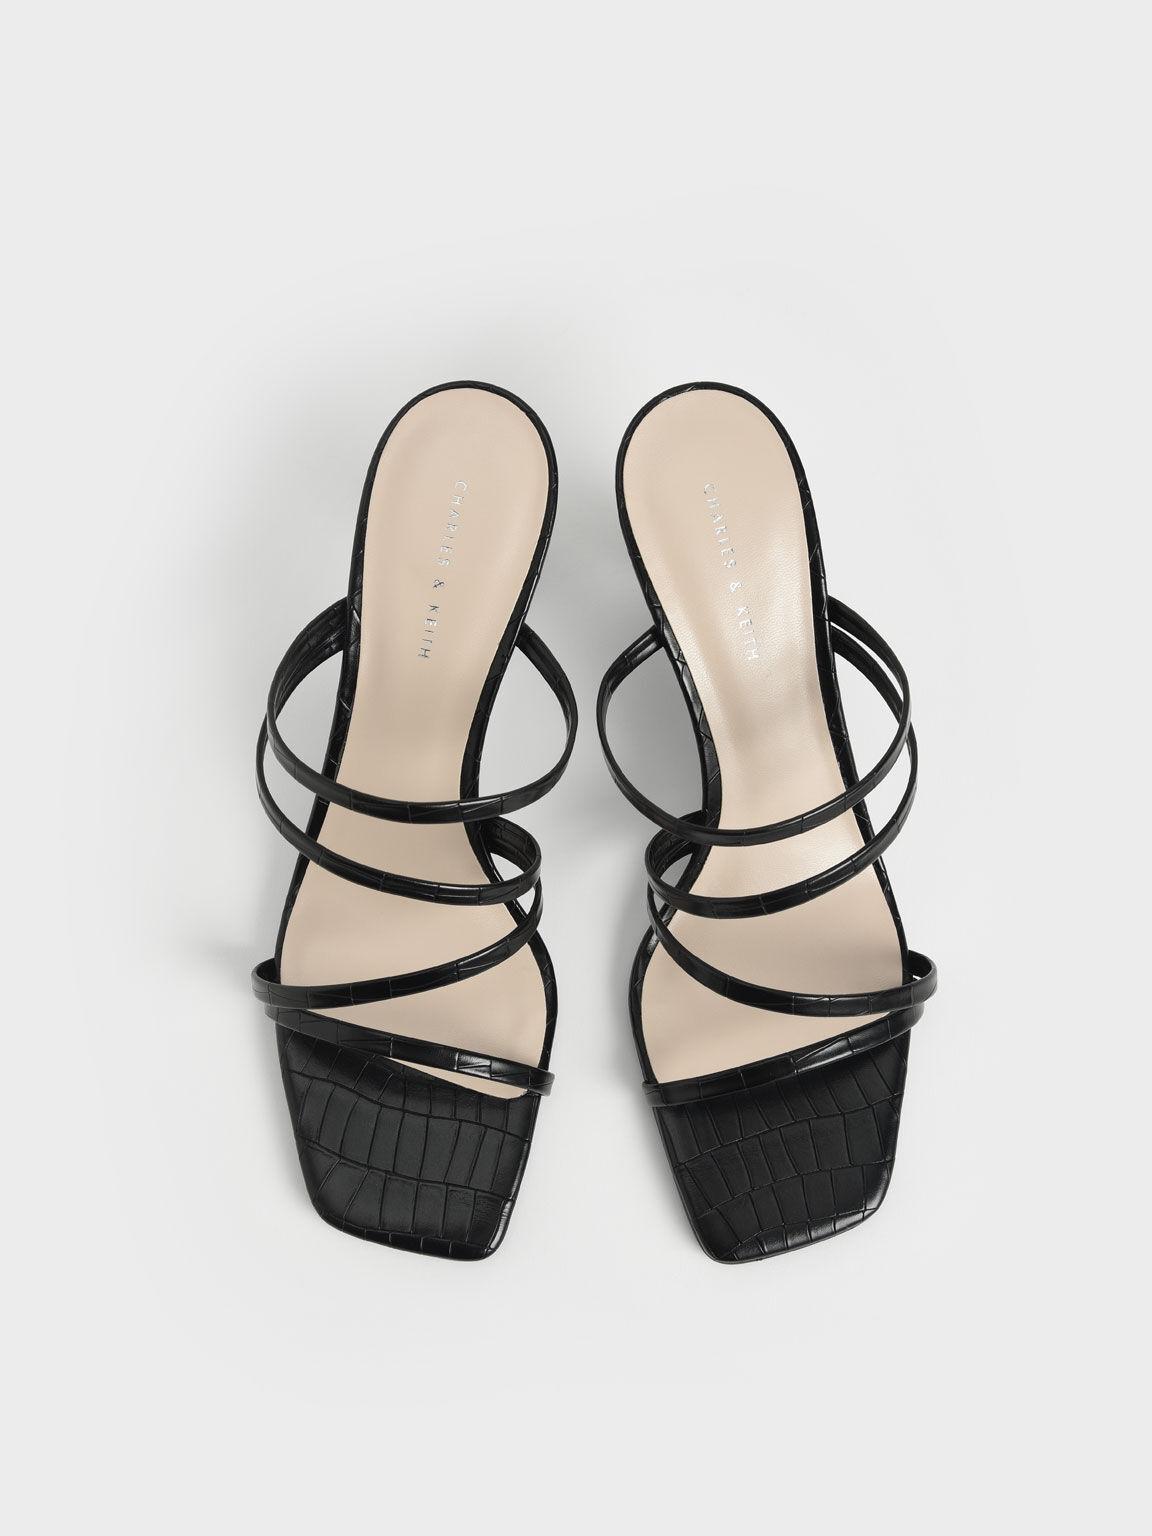 Croc-Effect Cylindrical Heel Mules, Animal Print Black, hi-res